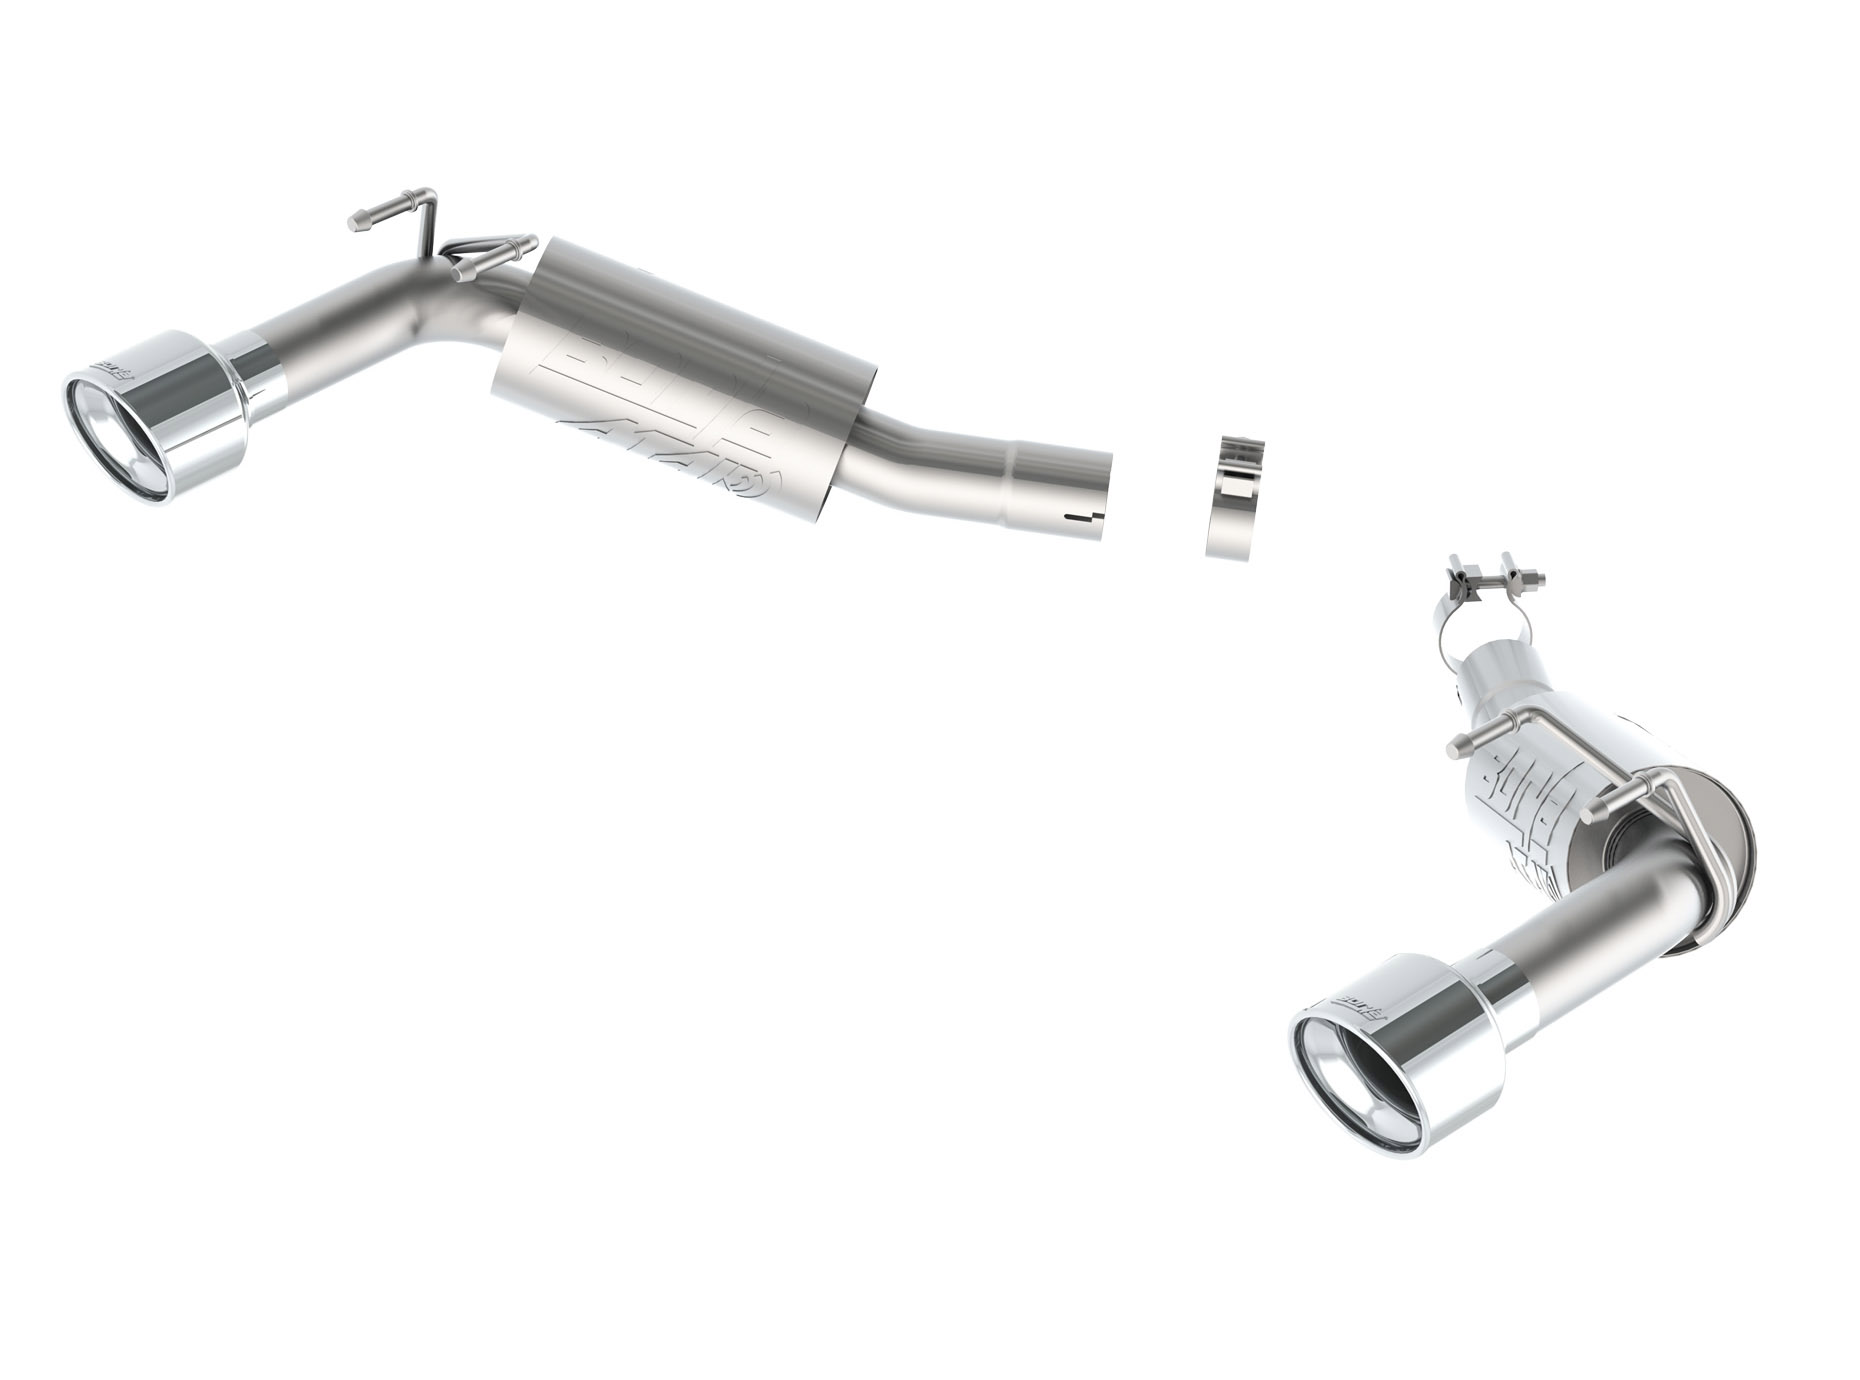 Borla Axle Back Exhaust ATAK for 14-15 Chevy Camaro SS 6